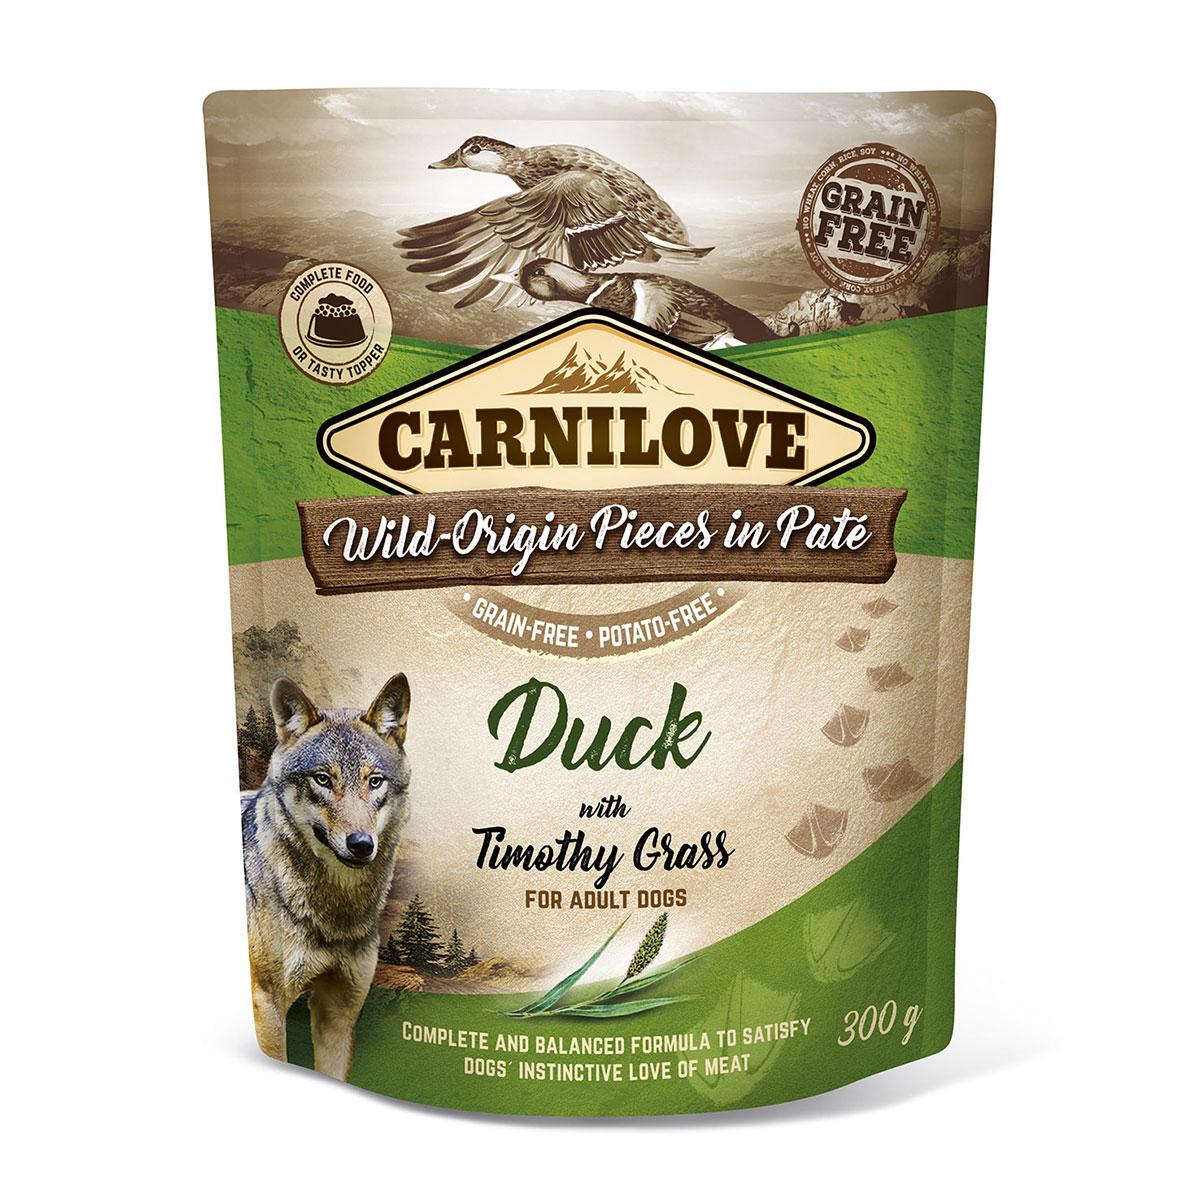 Carnilove Dog Pouch Paté Duck with Timothy Grass 300g 10 + 2 ZDARMA